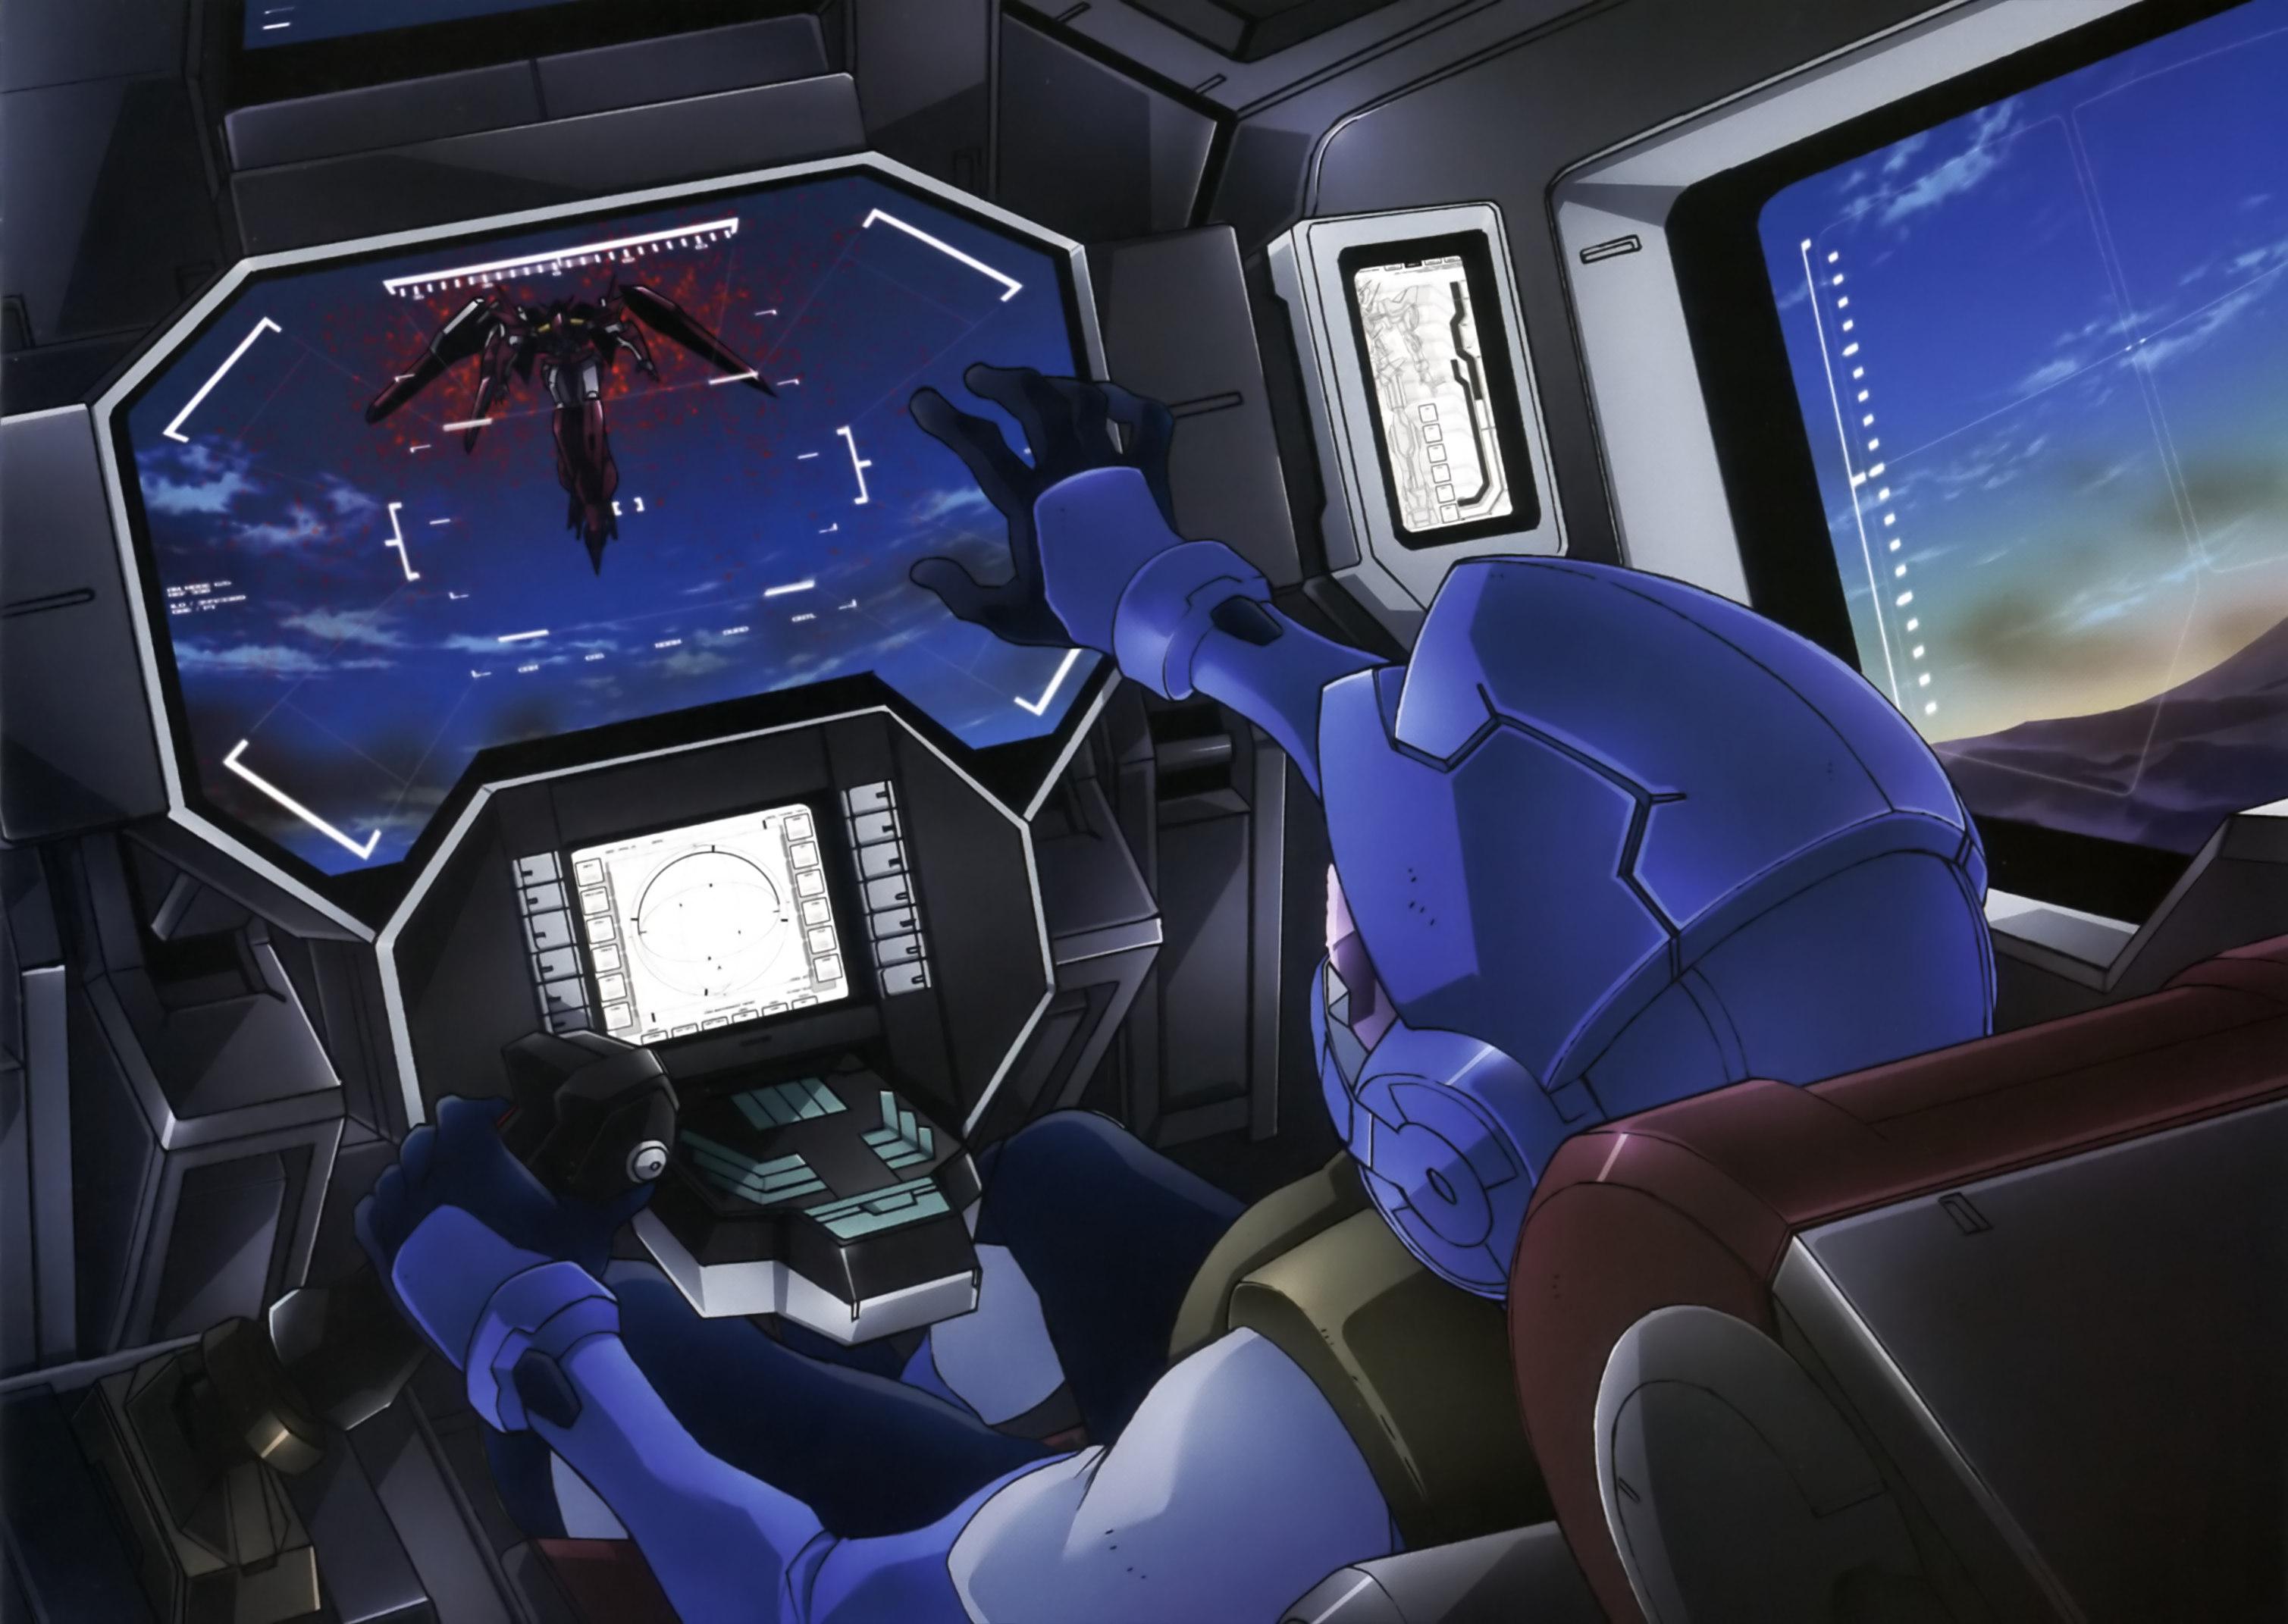 Mobile Suit Gundam 00 HD Wallpaper | Background Image | 3018x2142 ...